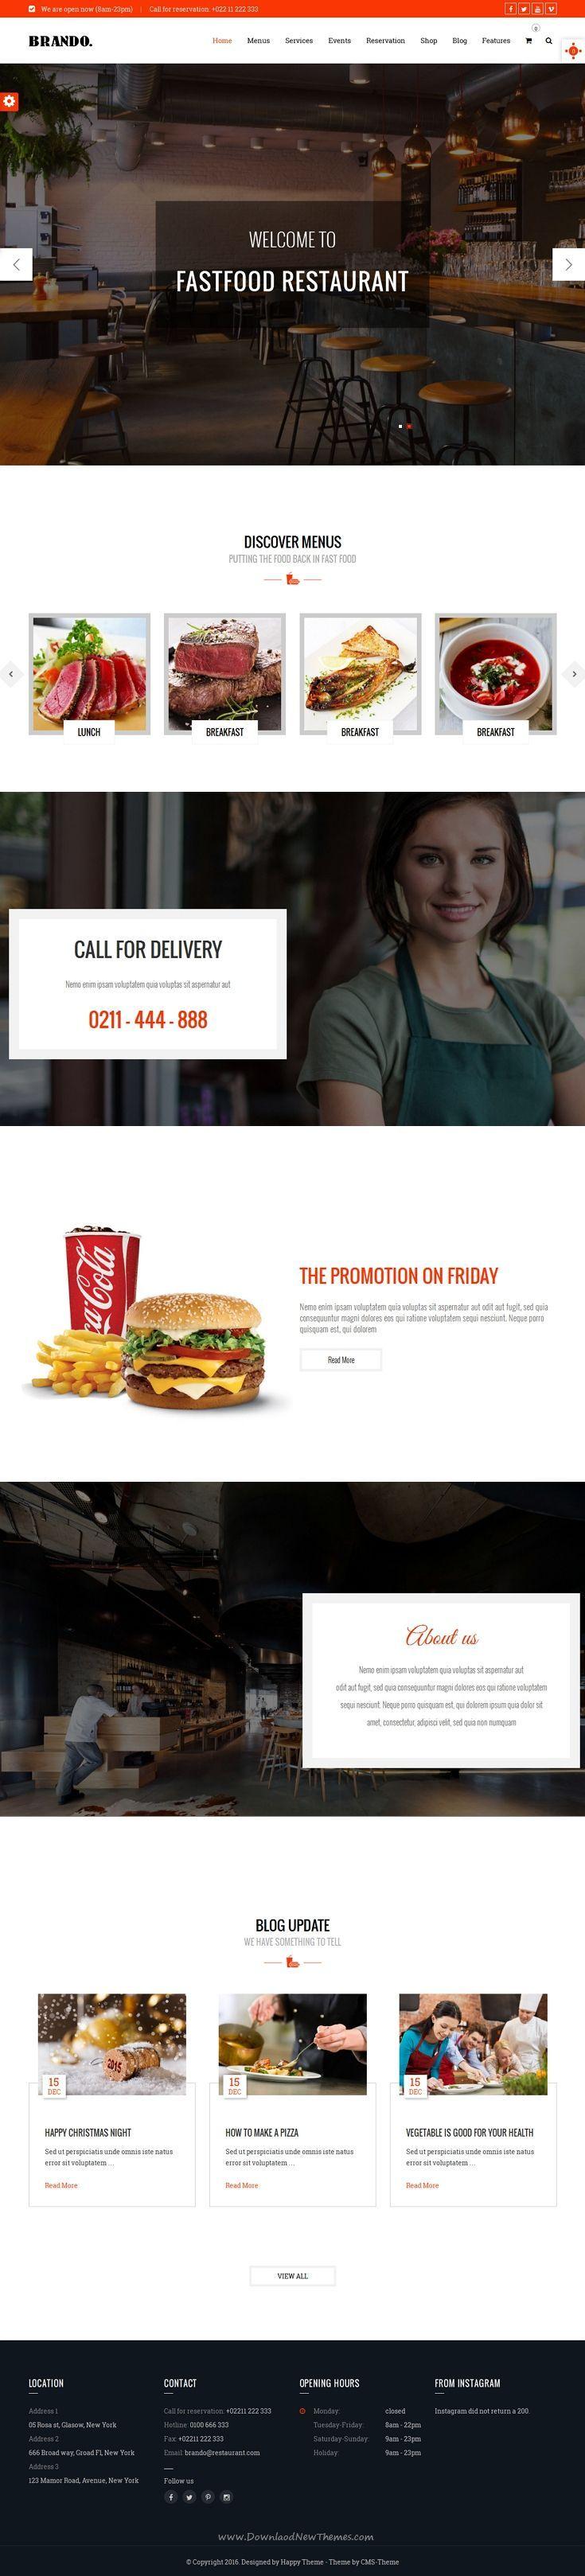 Brando is wonderful #Restaurant, Cafe, #FastFood Responsive #WordPress Theme with Food Menu Builder Download Now.